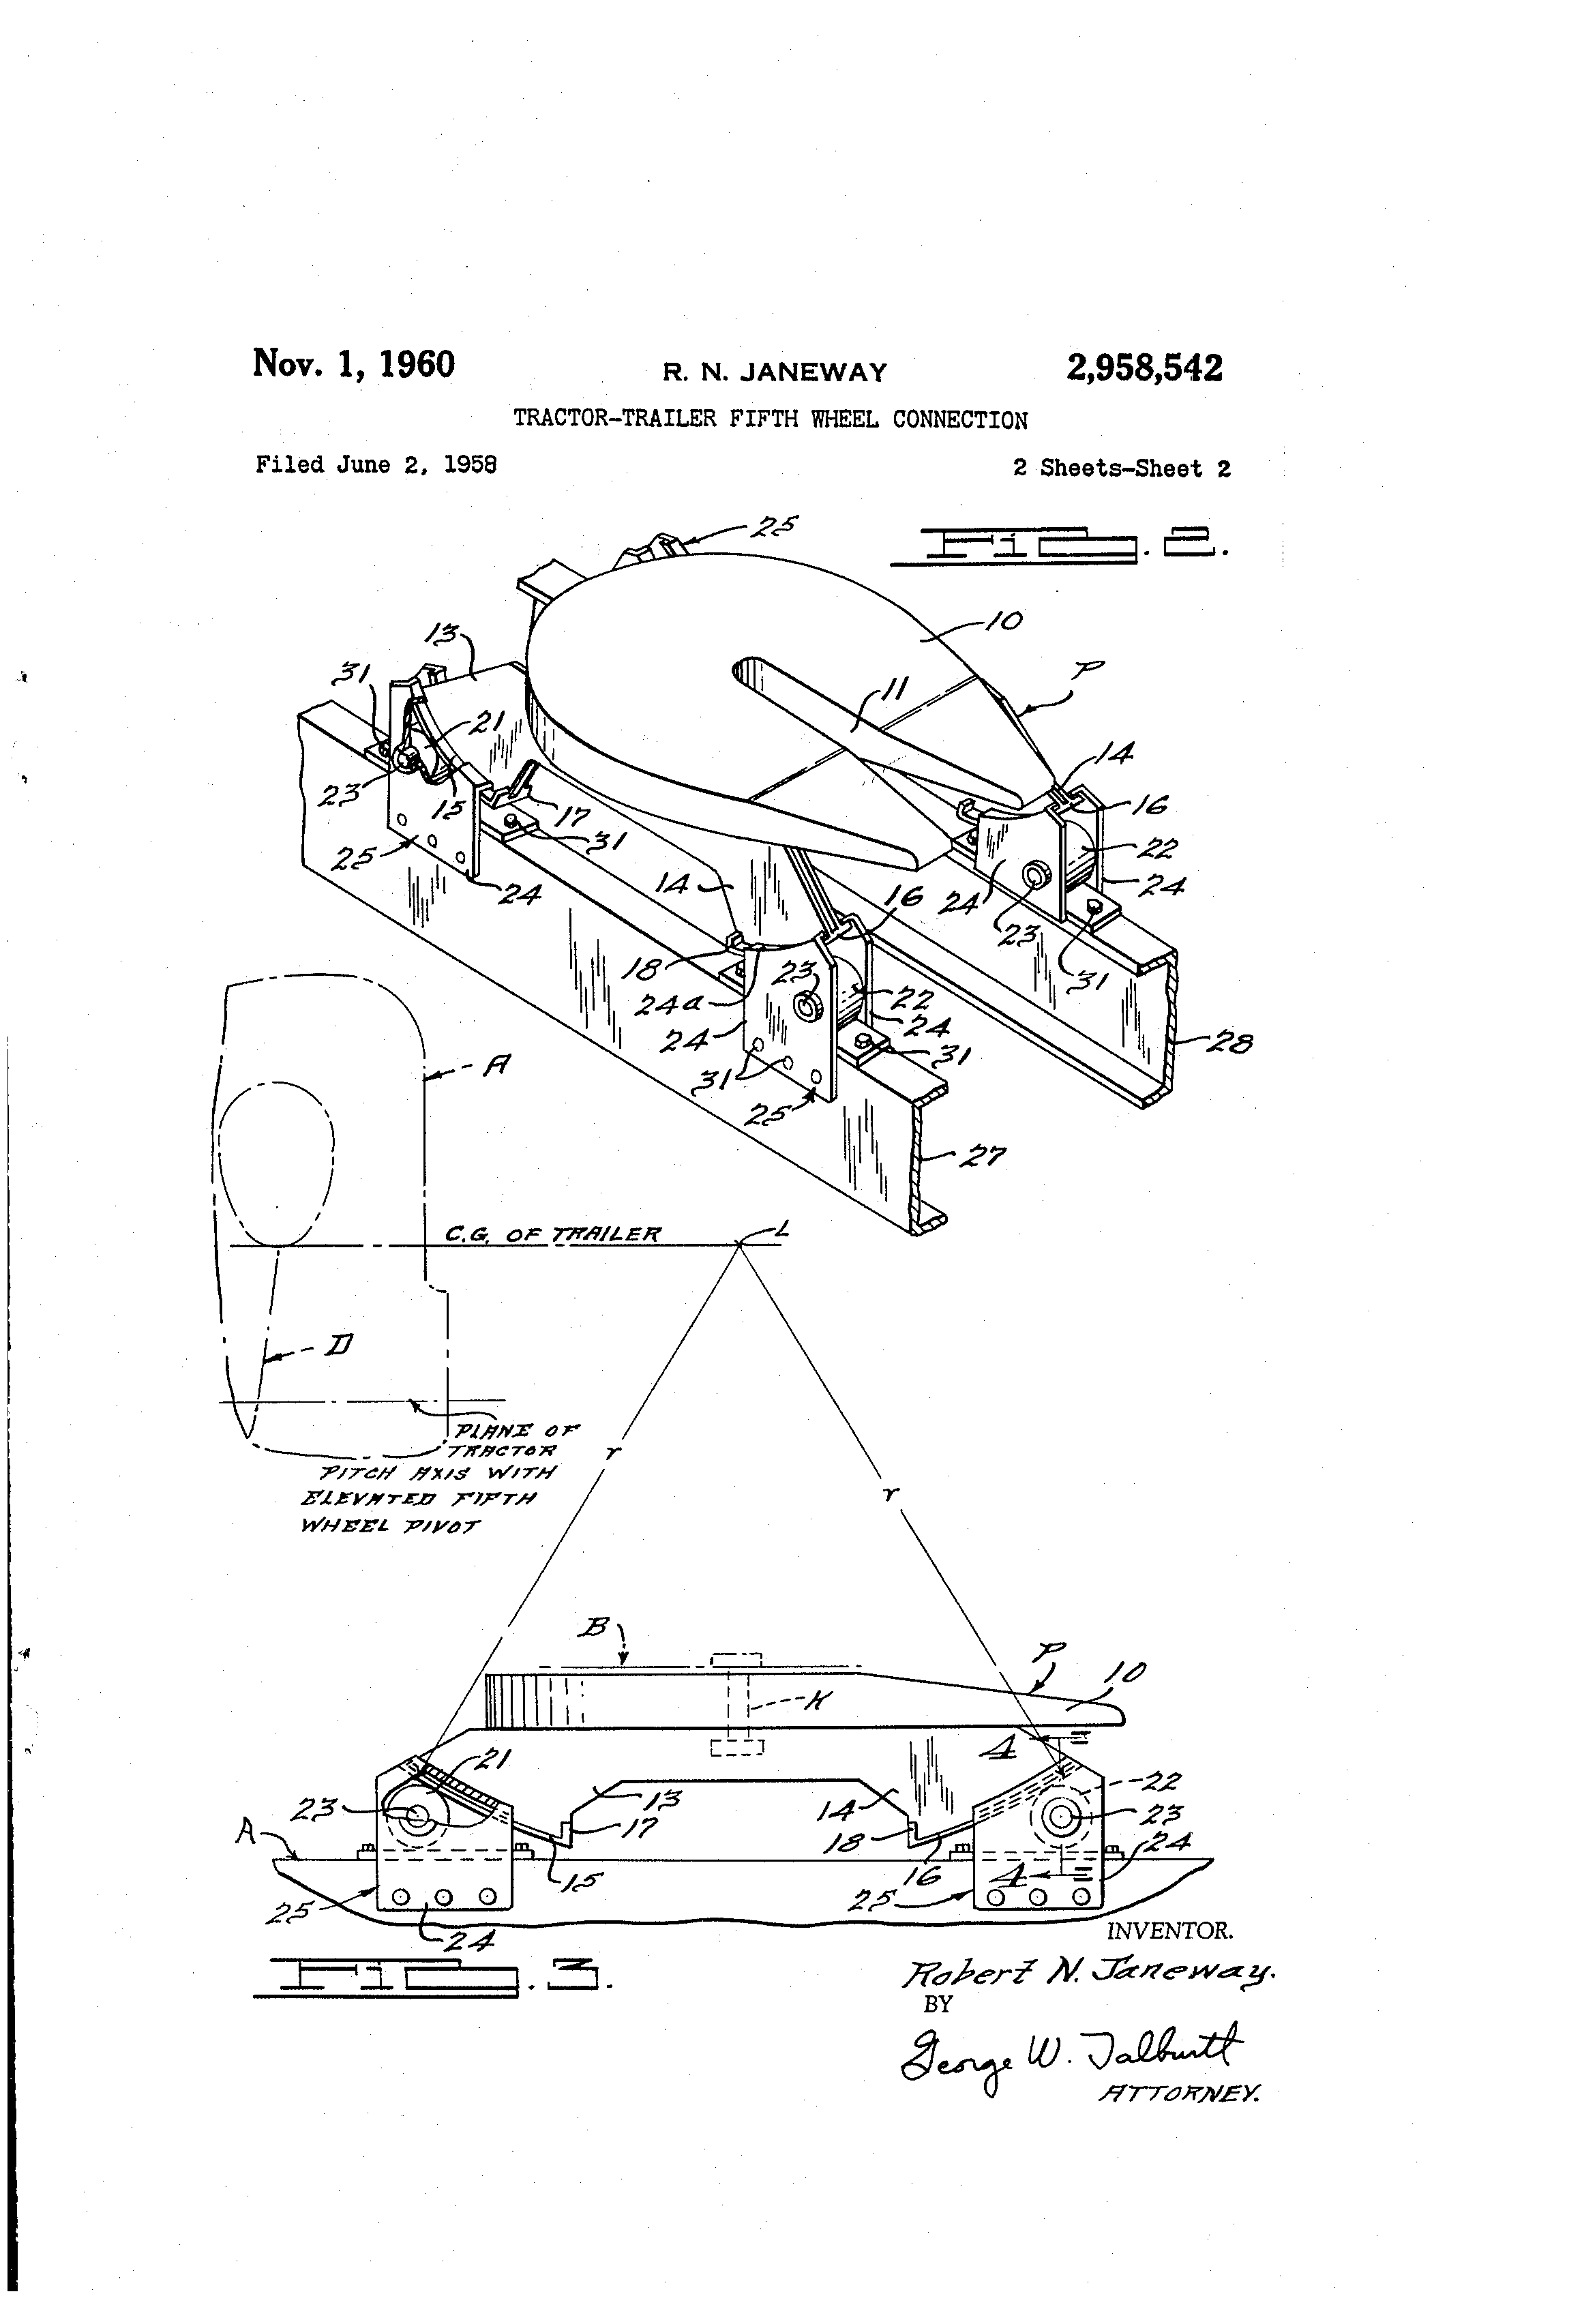 Arctic Fox 5th Wheel Wiring Diagram Trusted Diagrams Camper Portal U2022 992